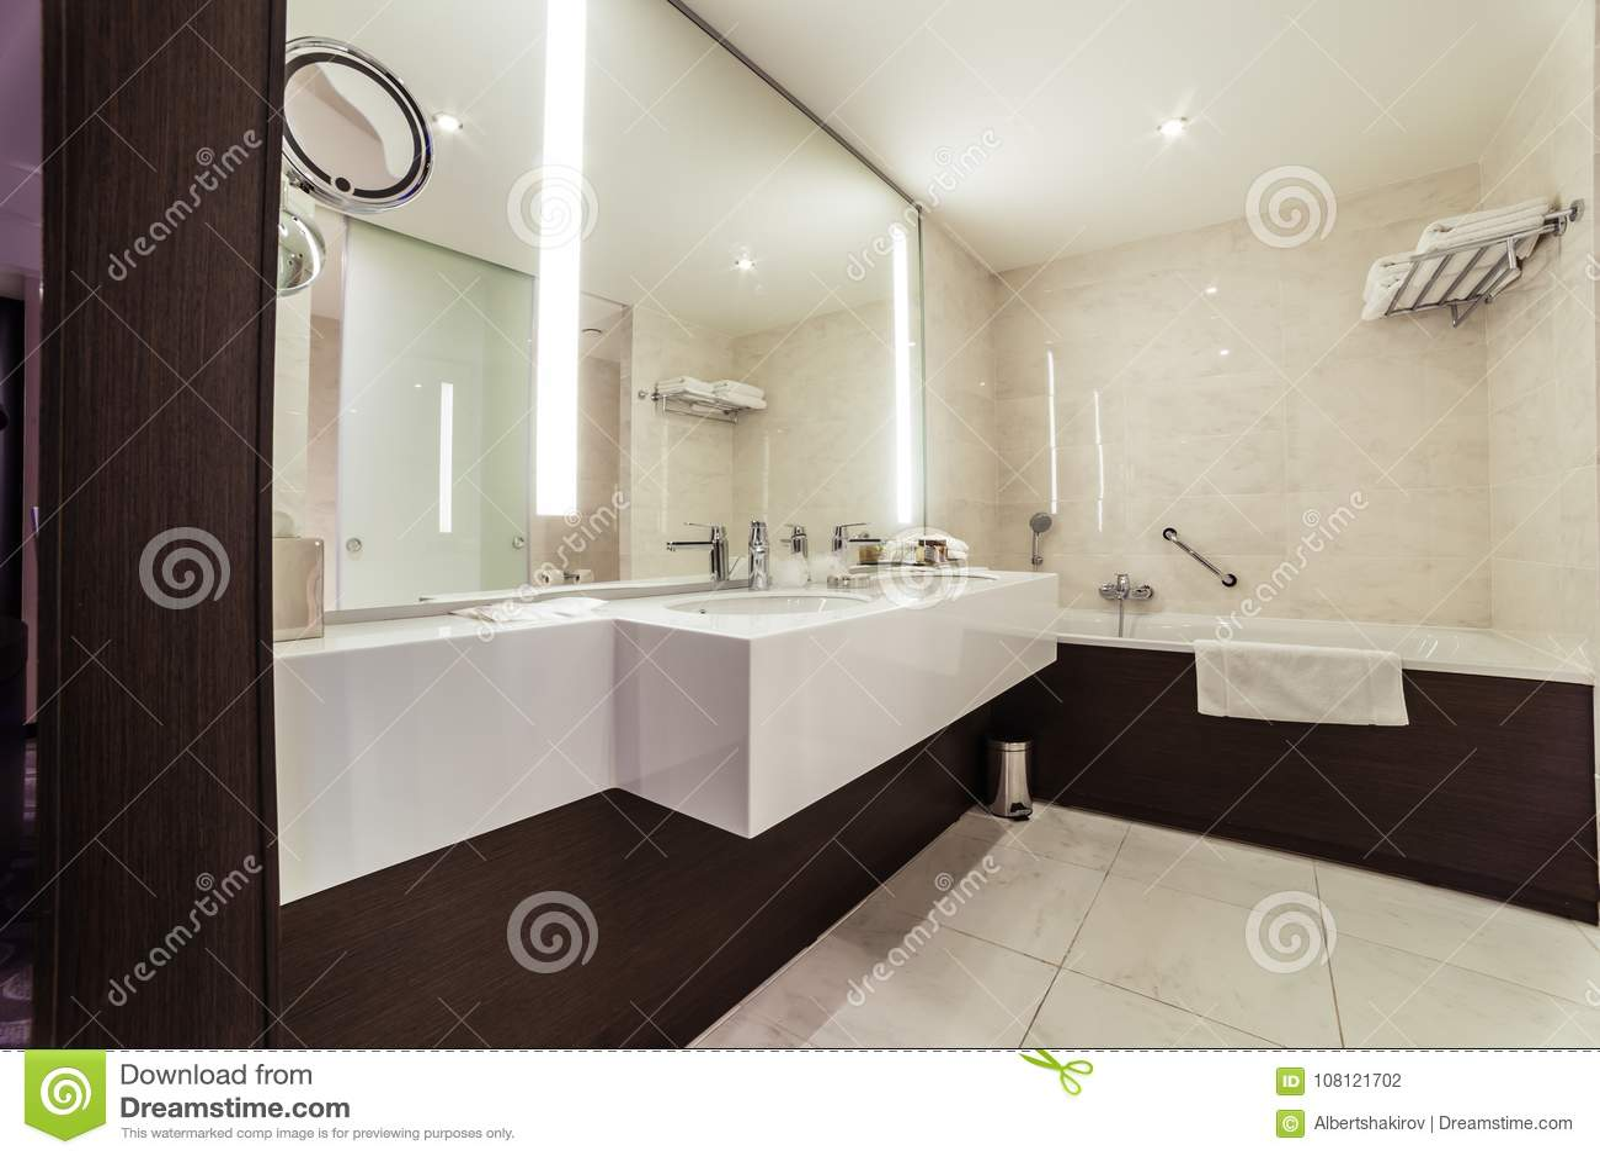 Designer Bathroom With Shower Tiling Stock Photo - Image of bathroom ...